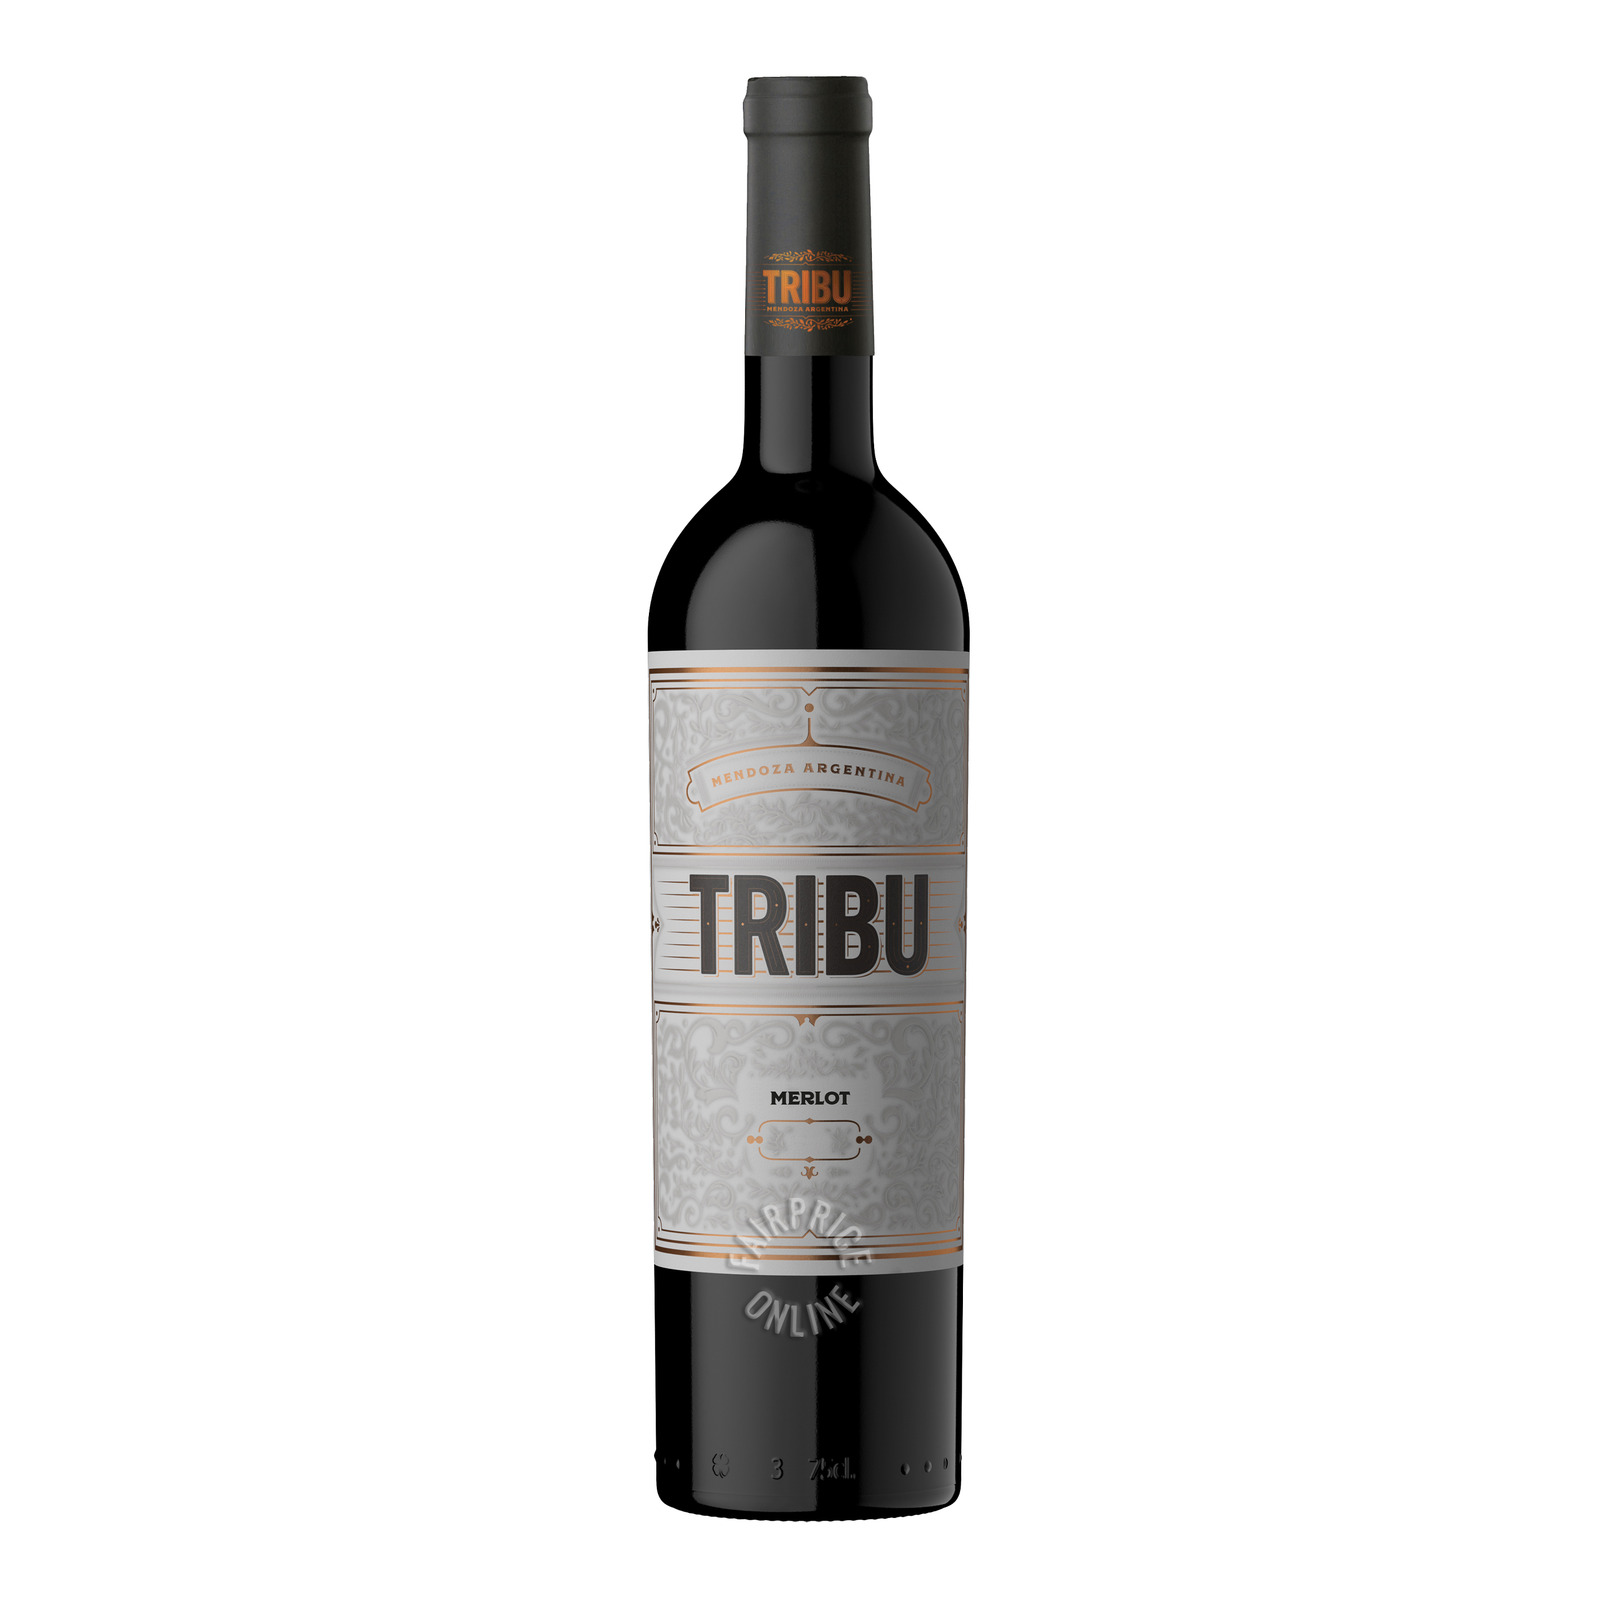 Trivento Tribu Red Wine - Merlot